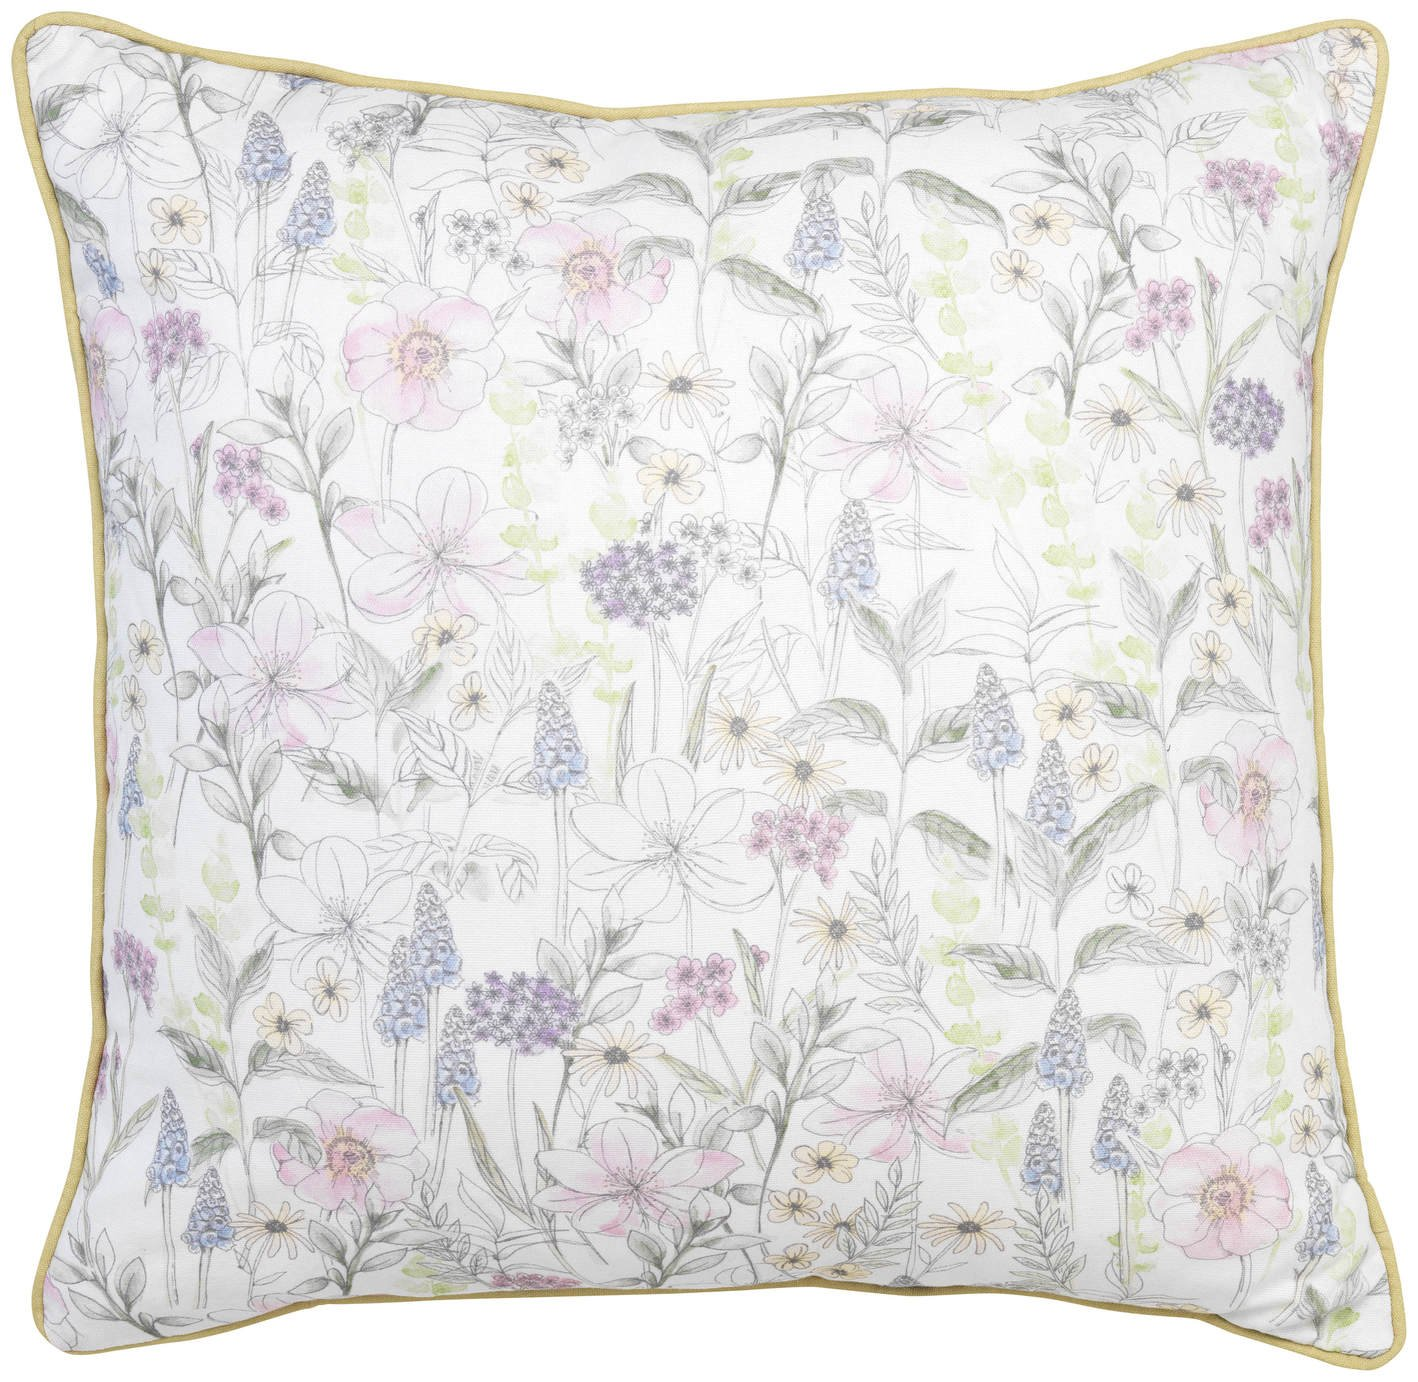 Sainsbury's Home Meadow Floral Printed Cushion